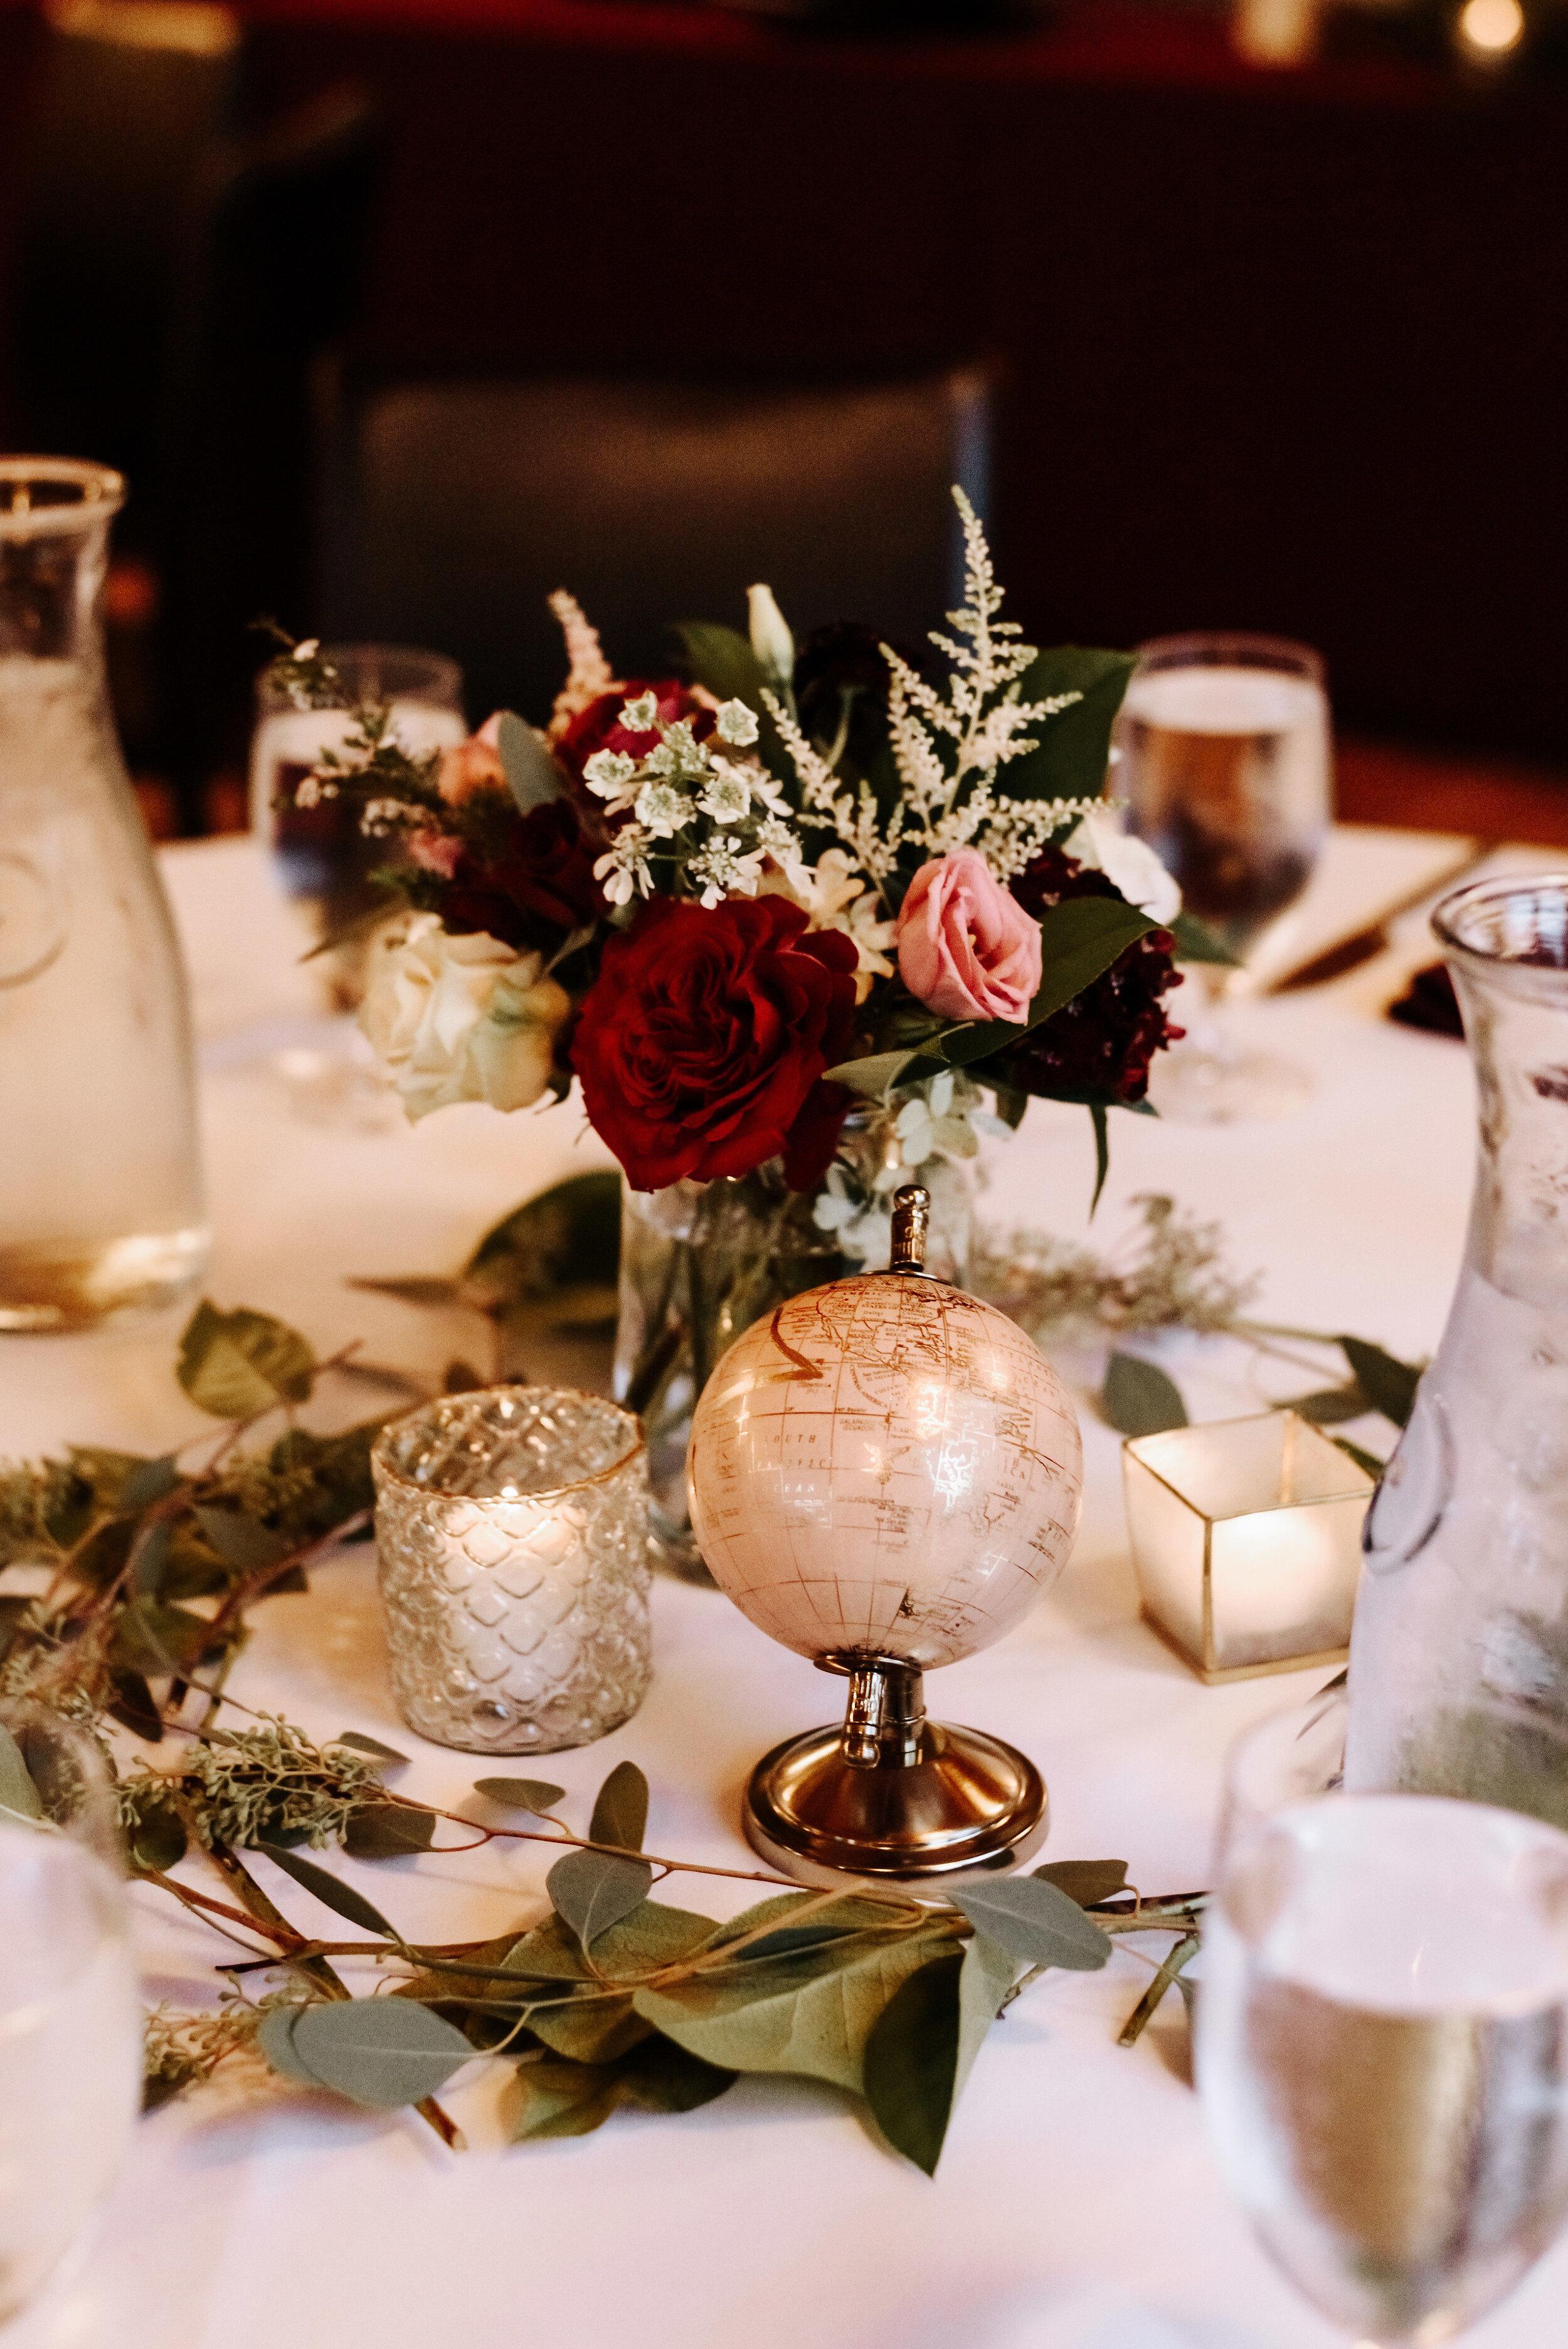 Allison_Nolan_Moss_Vineyards_Wedding_Charlottesville_Virginia_Photography_by_V_61.jpg